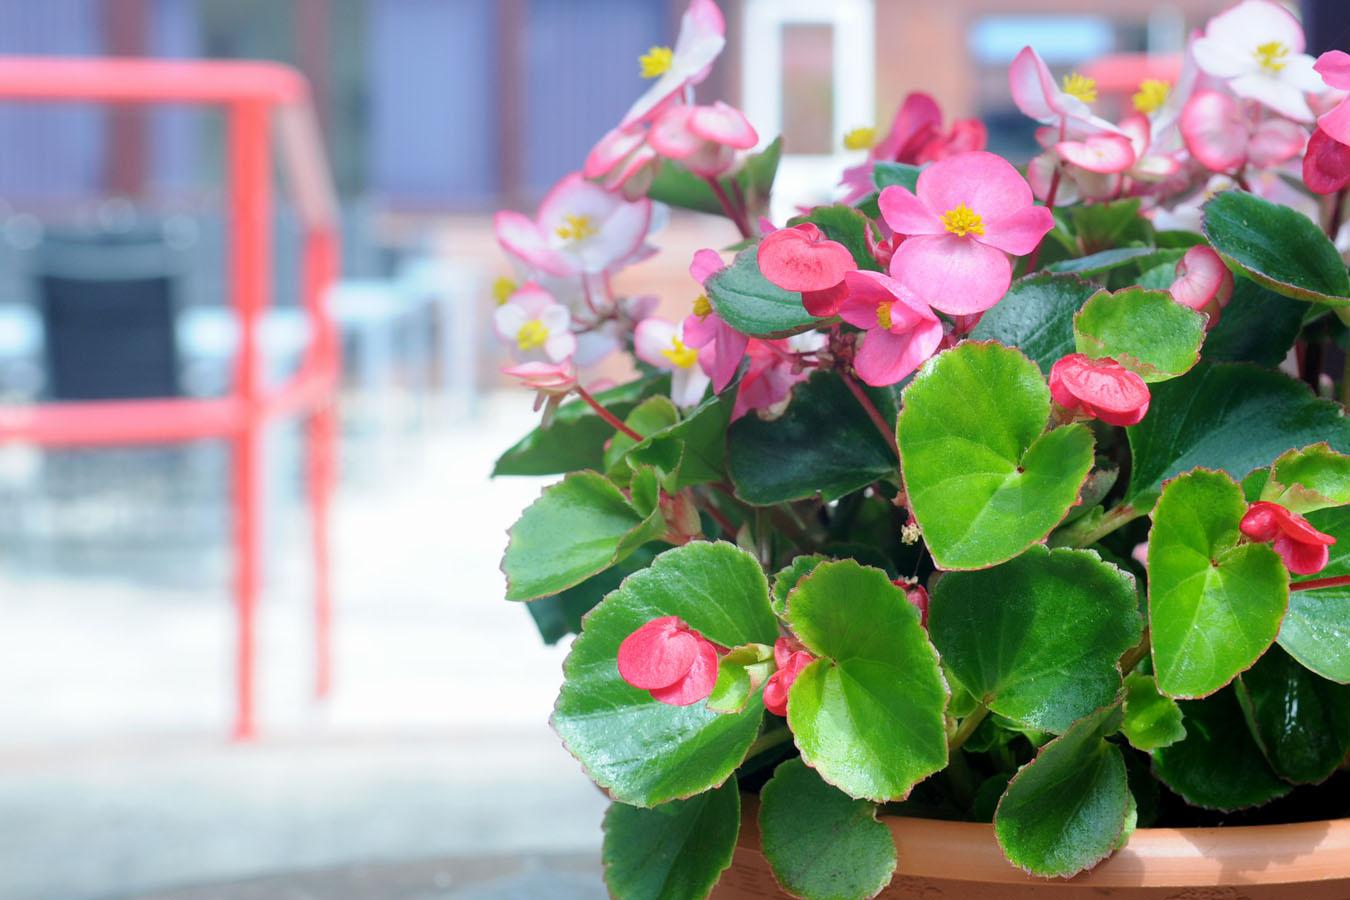 Manorfield Residential Home Flowers